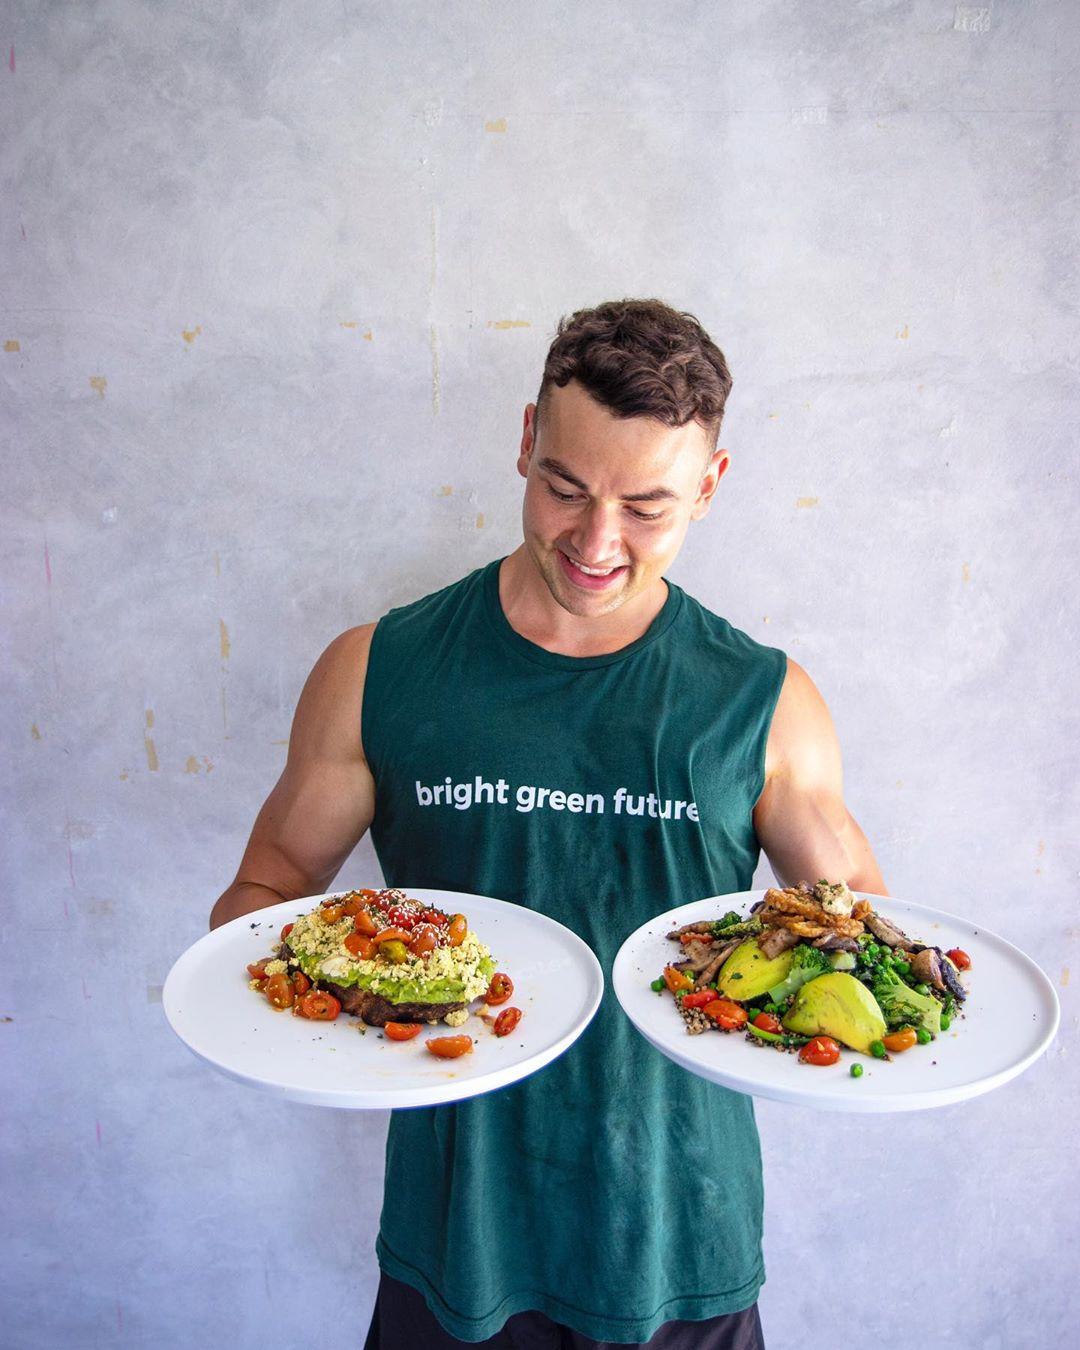 7 Vegan Influencers yang Wajib Diikuti